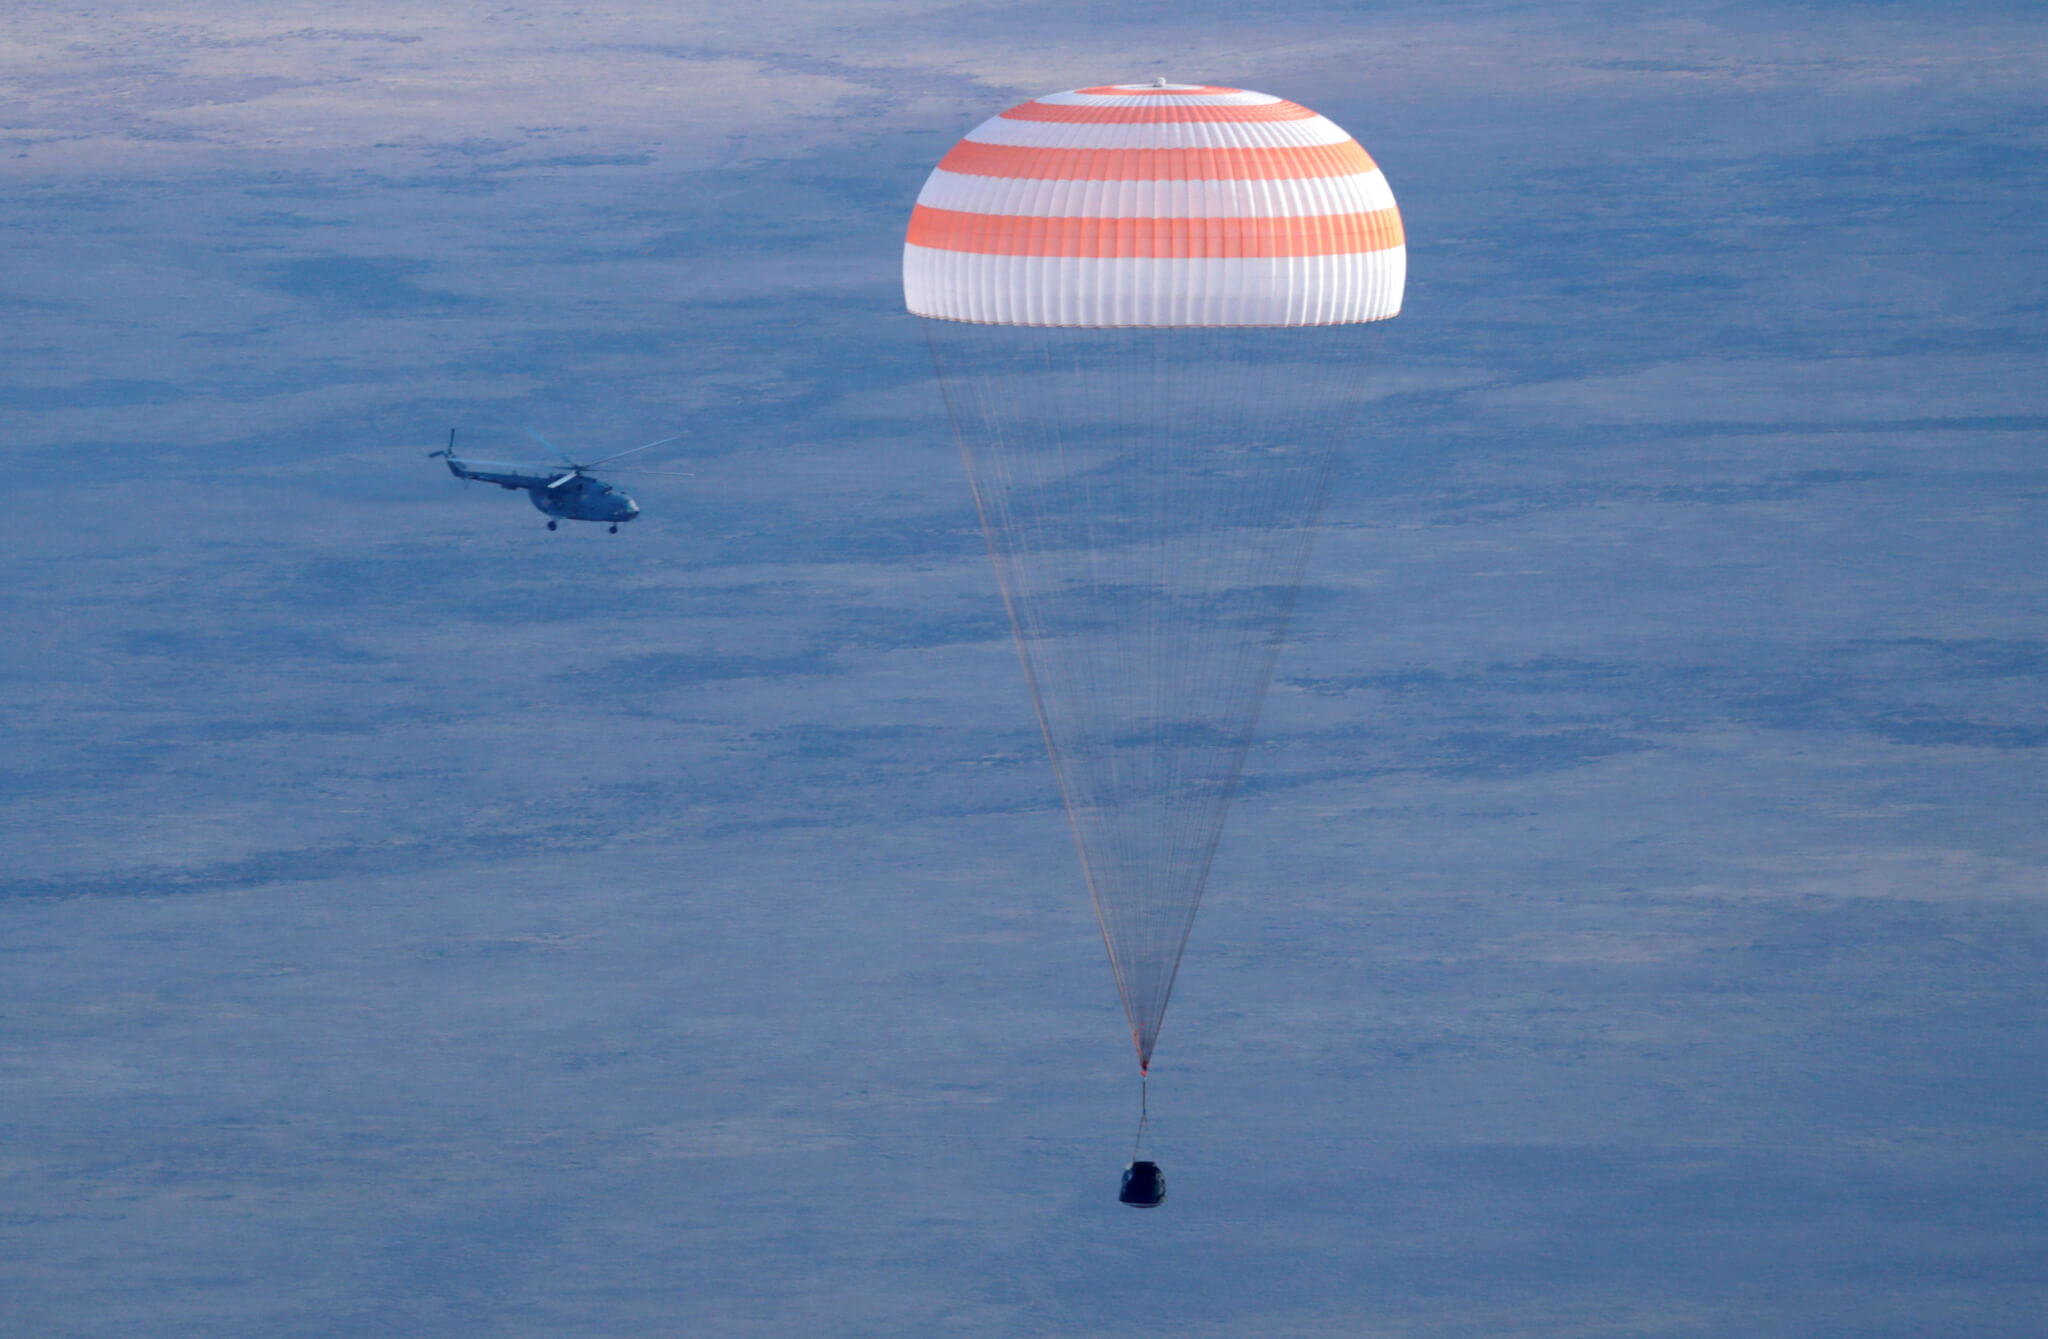 A Russian Soyuz MS space capsule carrying International Space Station (ISS) crew members, Kate Rubins of the U.S., Anatoly Ivanishin of Russia and Takuya Onishi of Japan, descends outside the town of Dzhezkazgan (Zhezkazgan), Kazakhstan, October 30, 2016. REUTERS/Dmitri Lovetsky/Pool